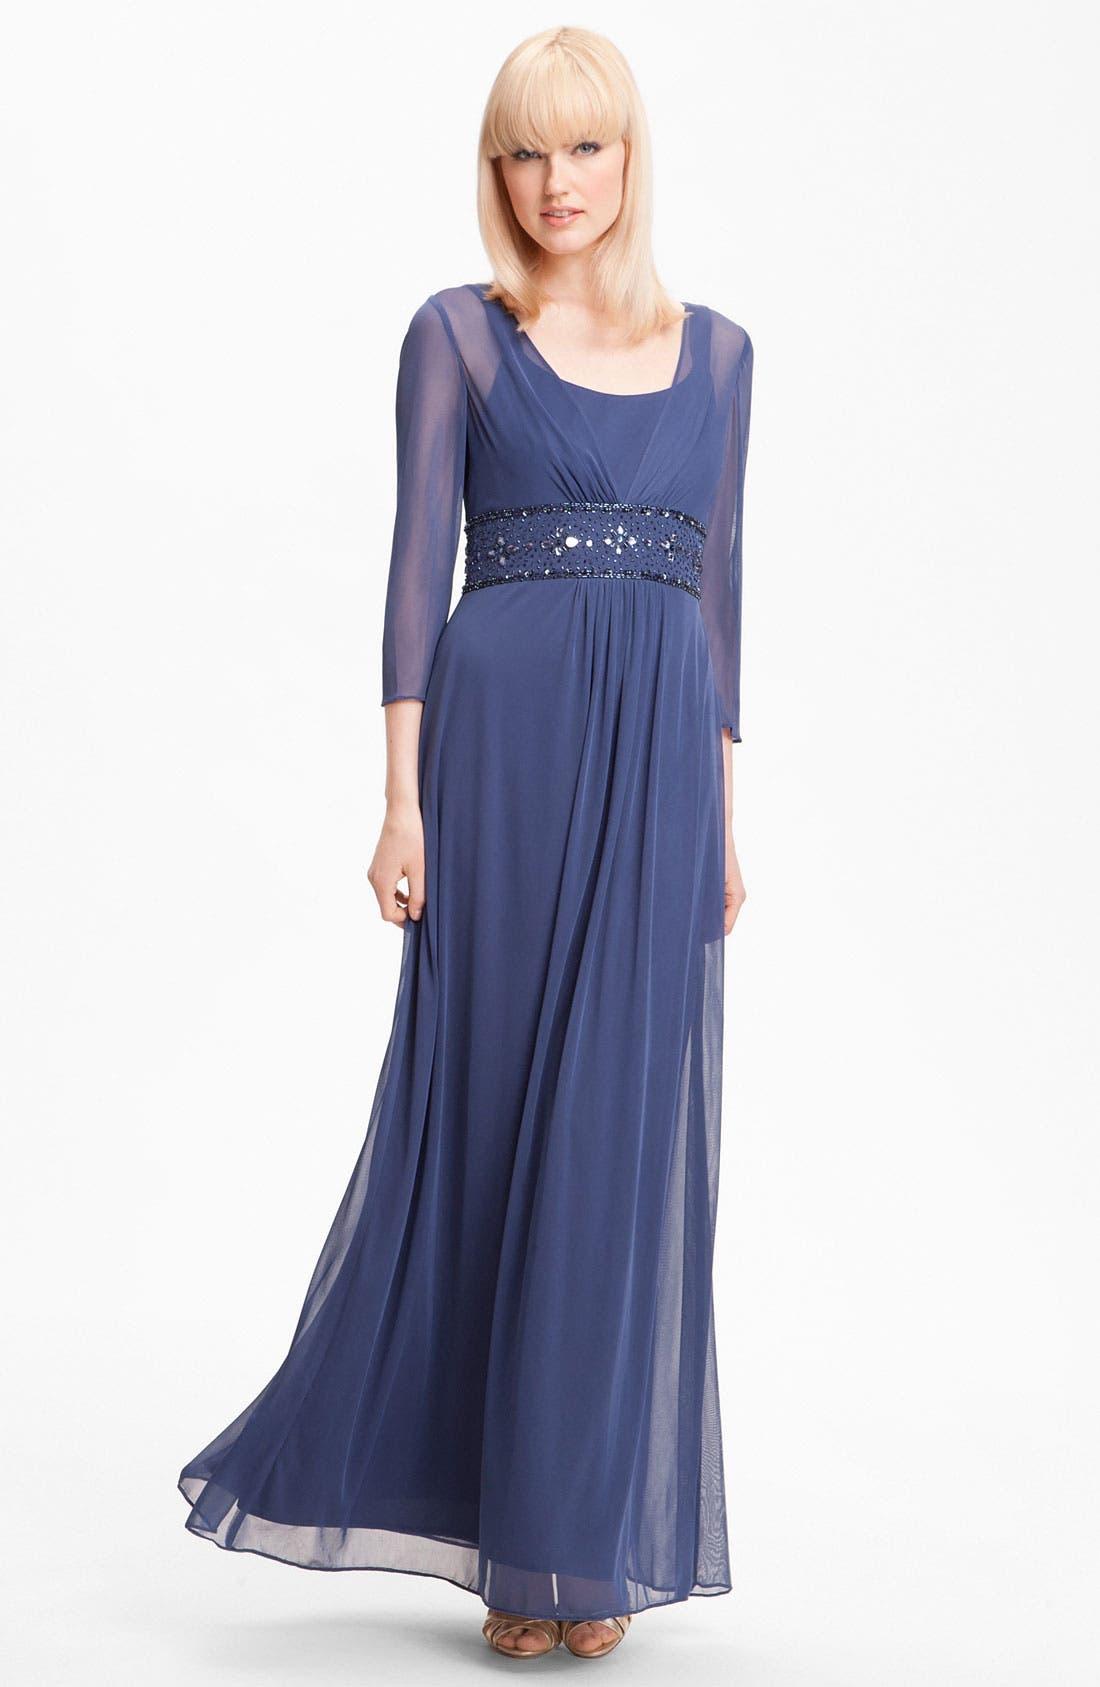 Alternate Image 1 Selected - Alex Evenings Long Sleeve Bead Waist Mesh Gown (Petite)